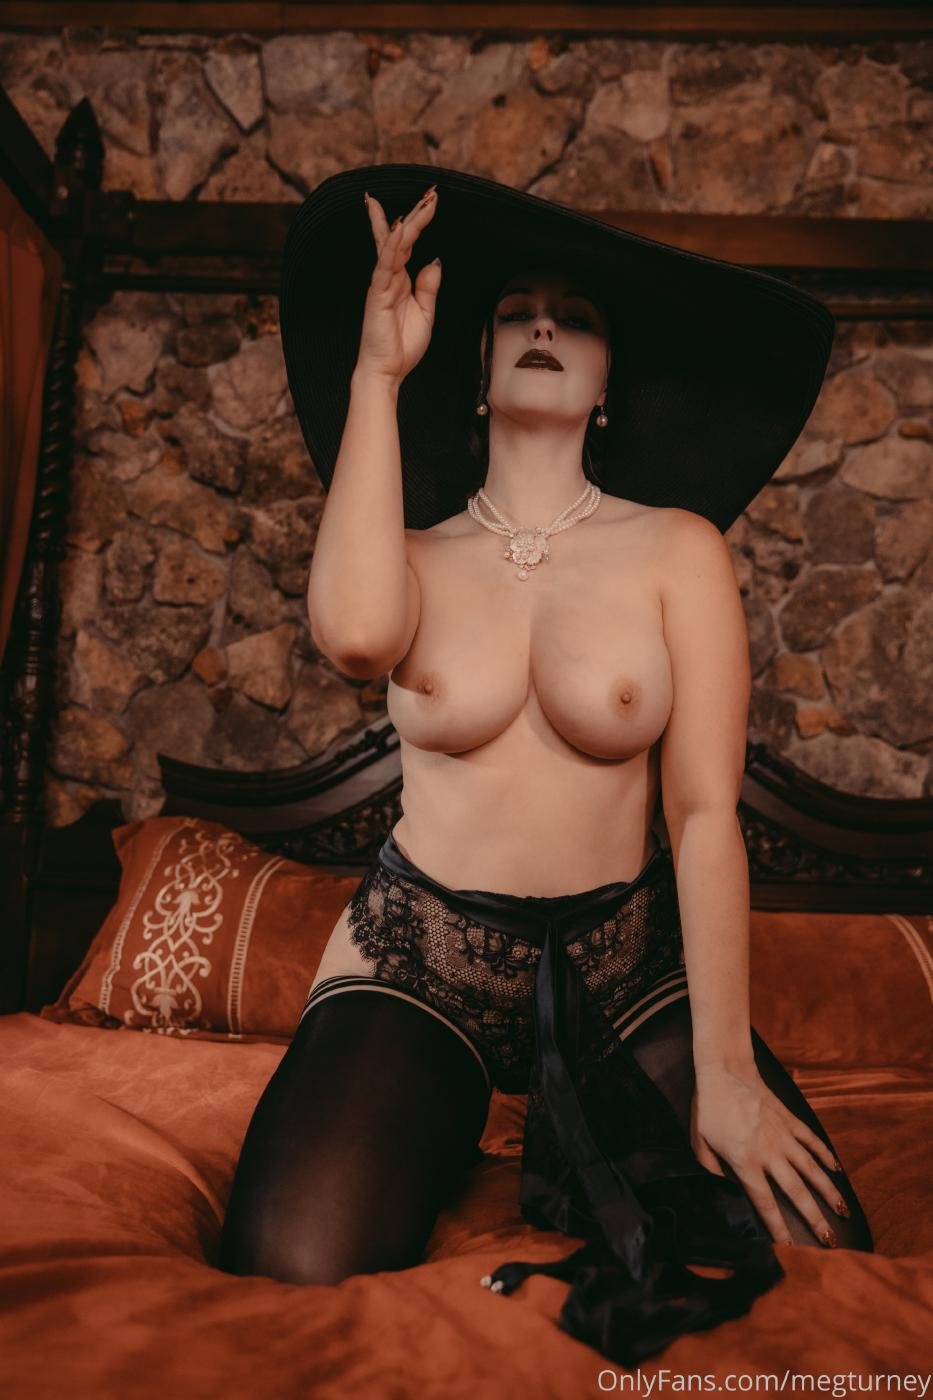 Meg Turney Lady Dimitrescu Cosplay Onlyfans Set Leaked 0010